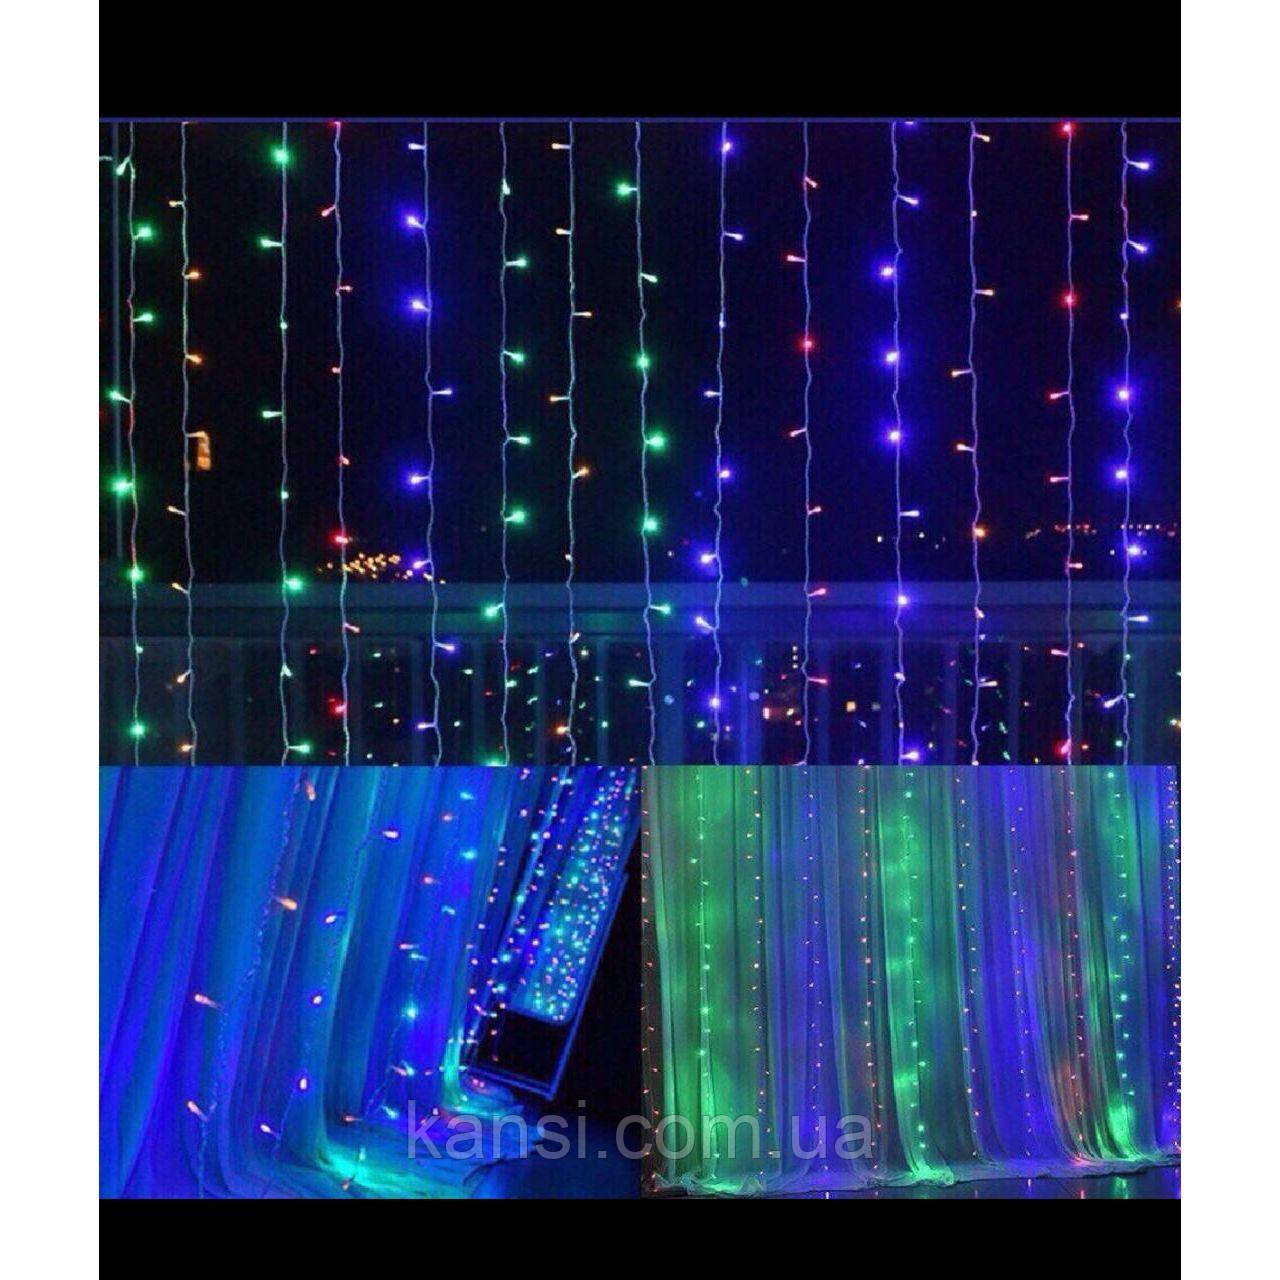 Гирлянда Штора Led 400 мультицветная 3м*2м, светодиодная гирлянда Водопад, гирлянда Микс